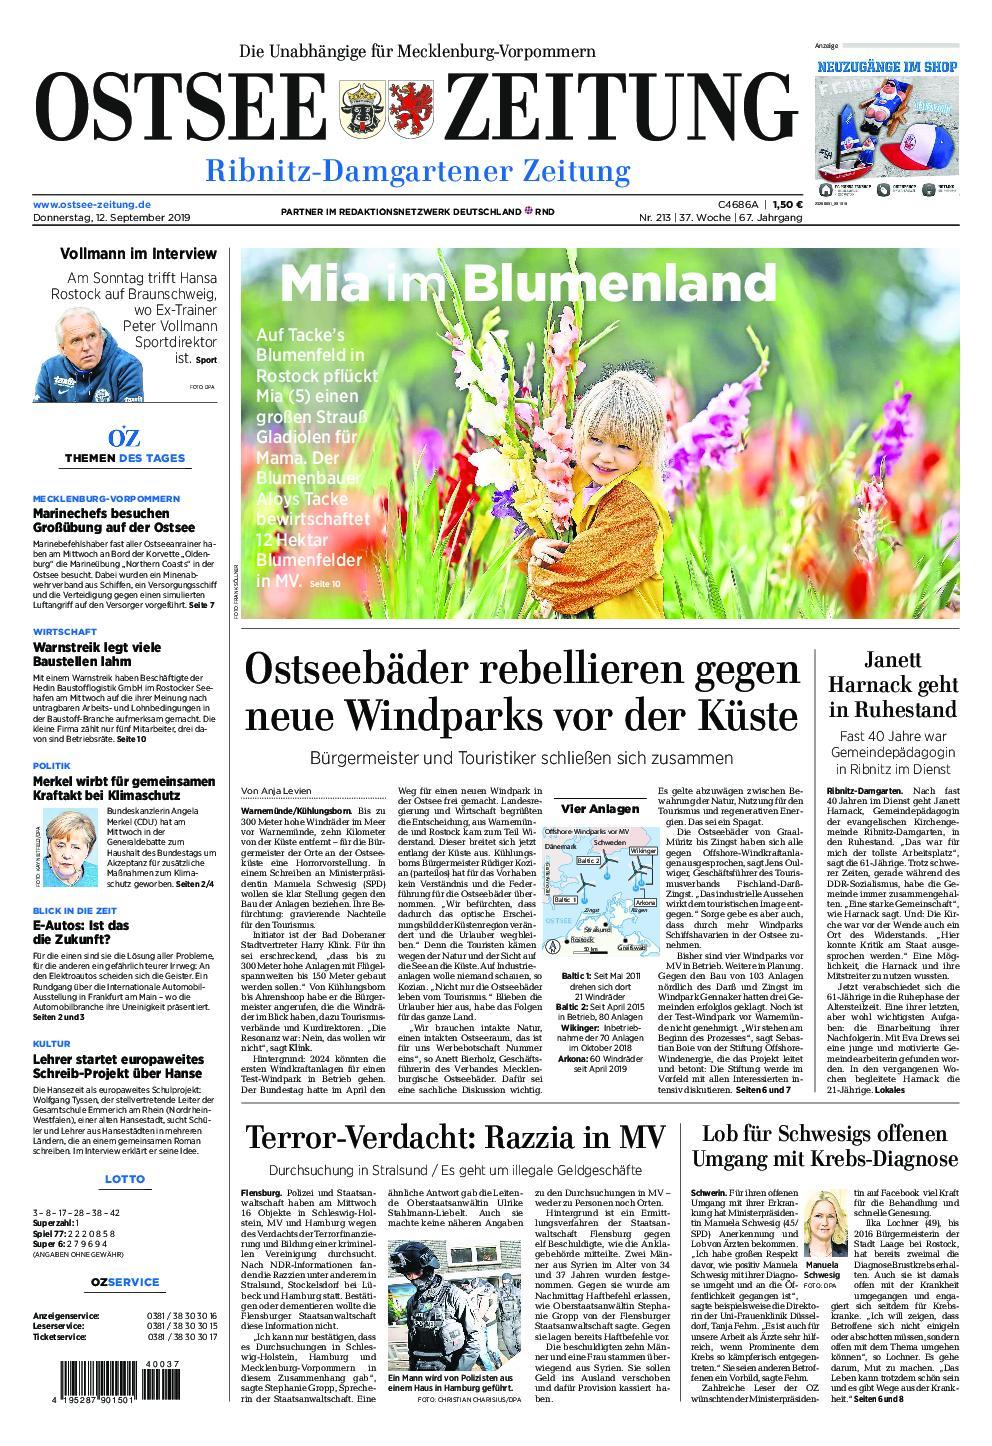 Ostsee Zeitung Ribnitz-Damgarten - 12. September 2019